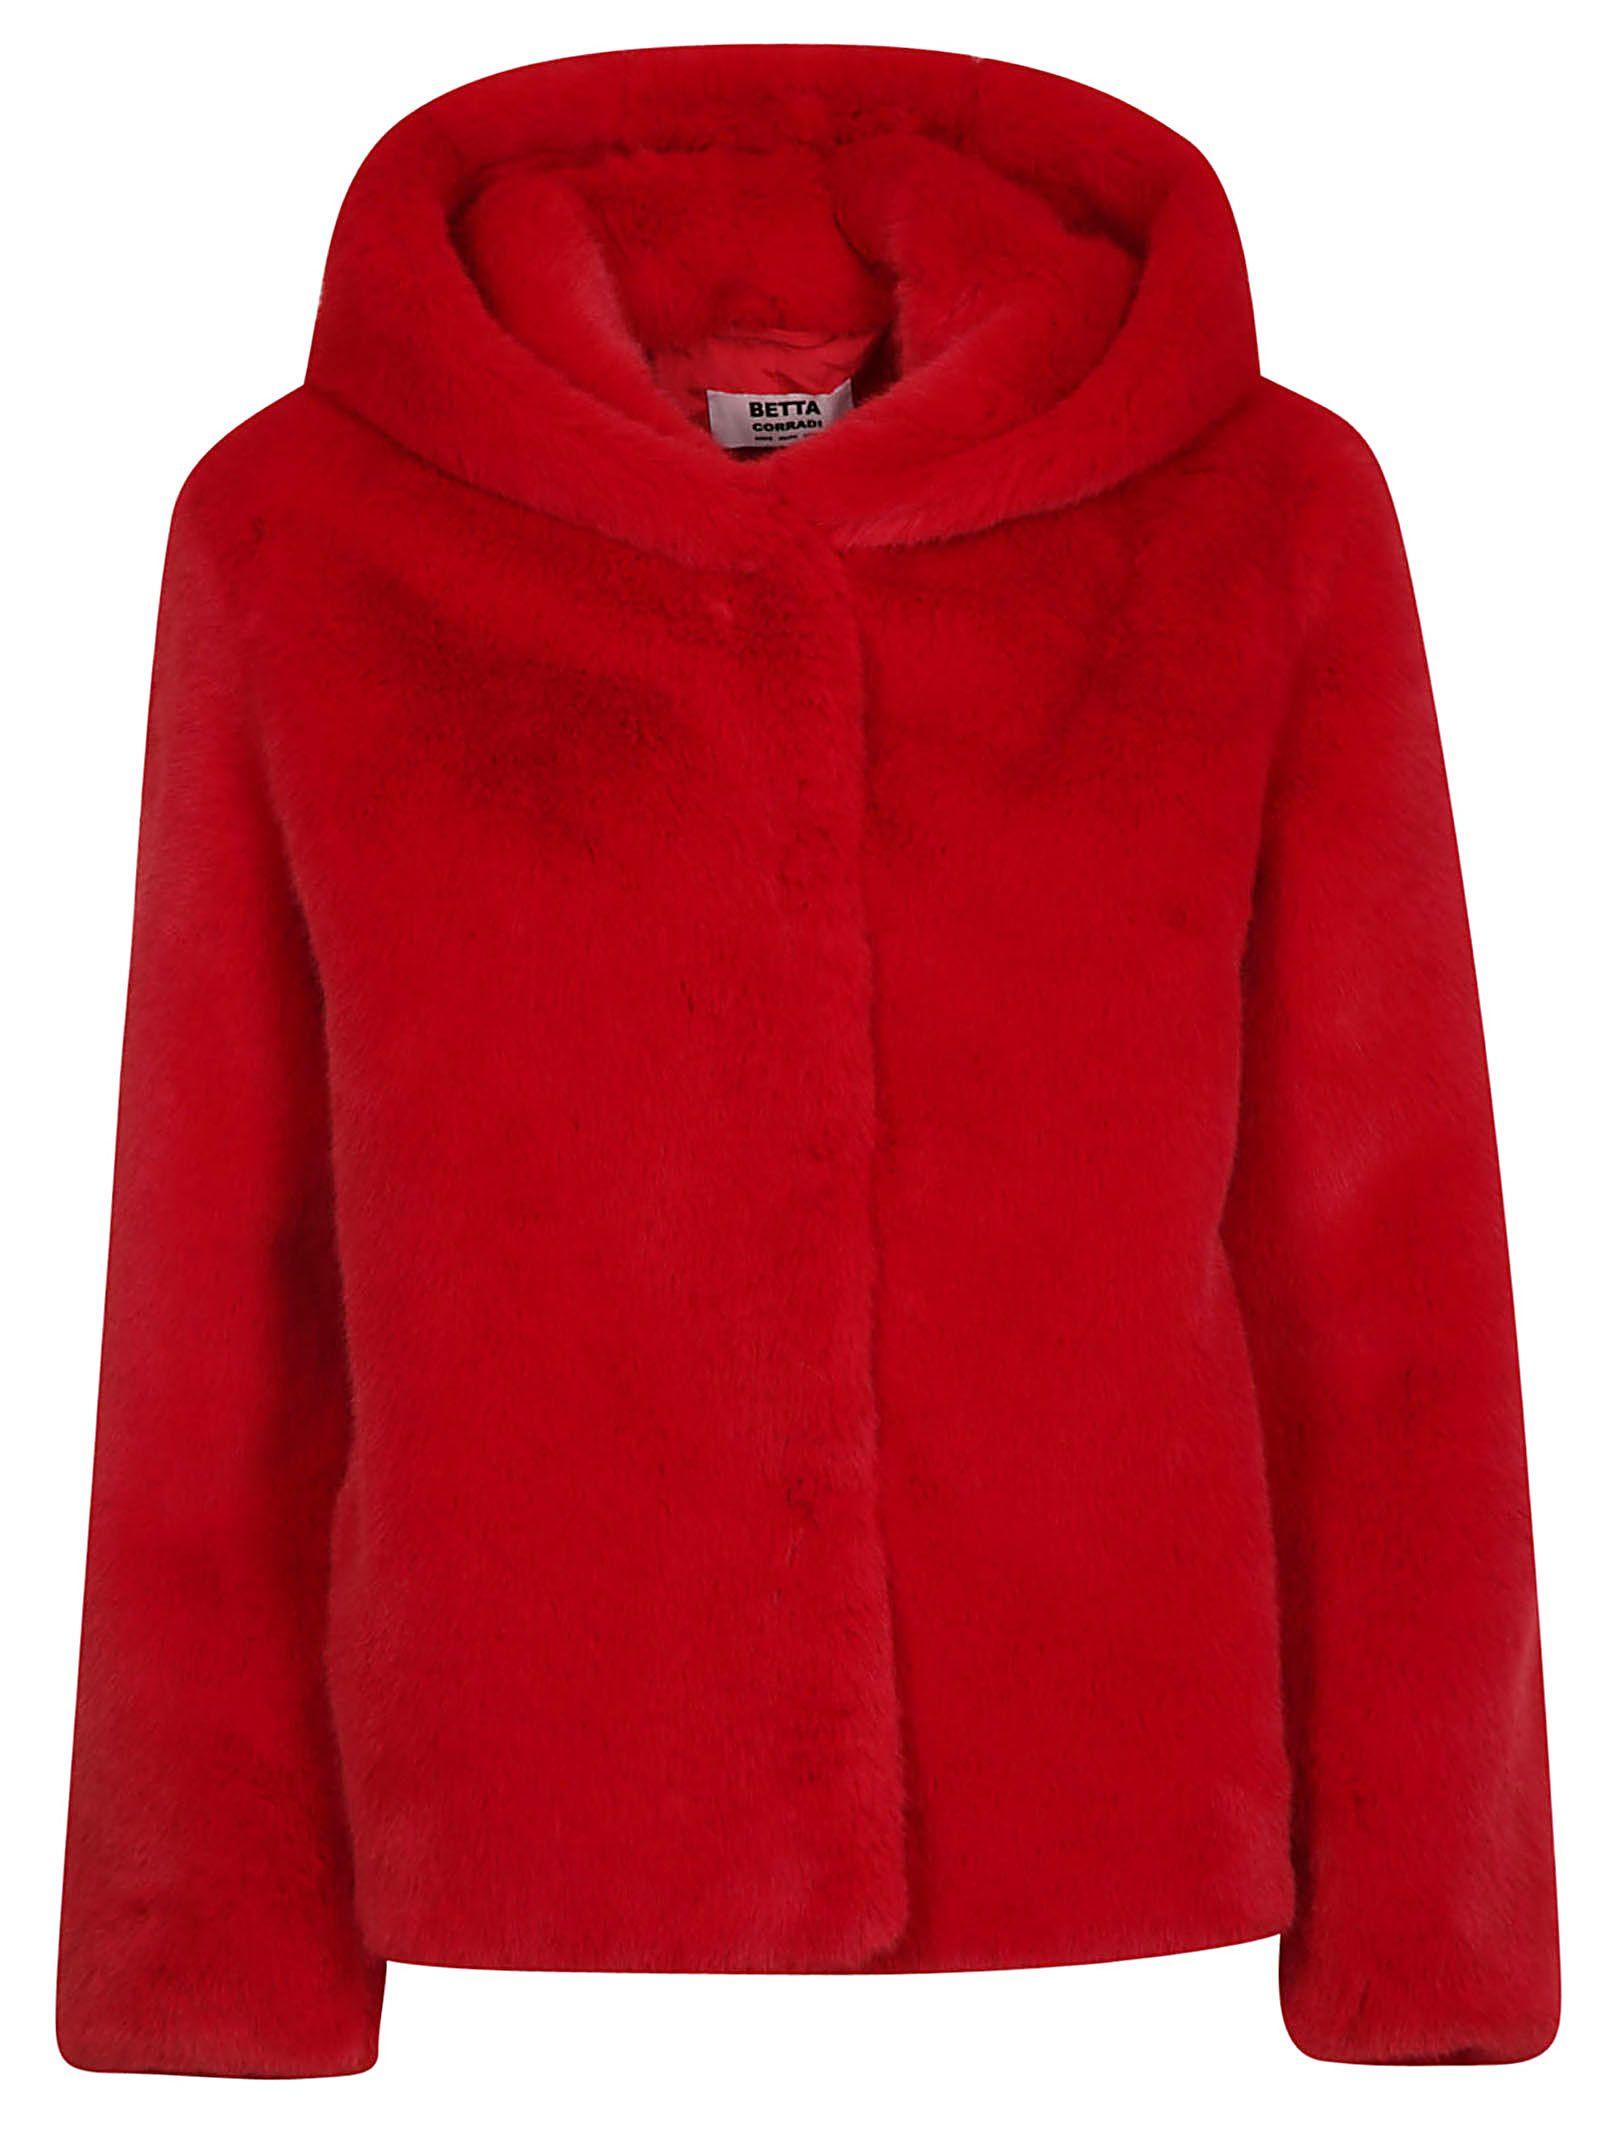 BETTA CORRADI Fur Hooded Jacket in Red